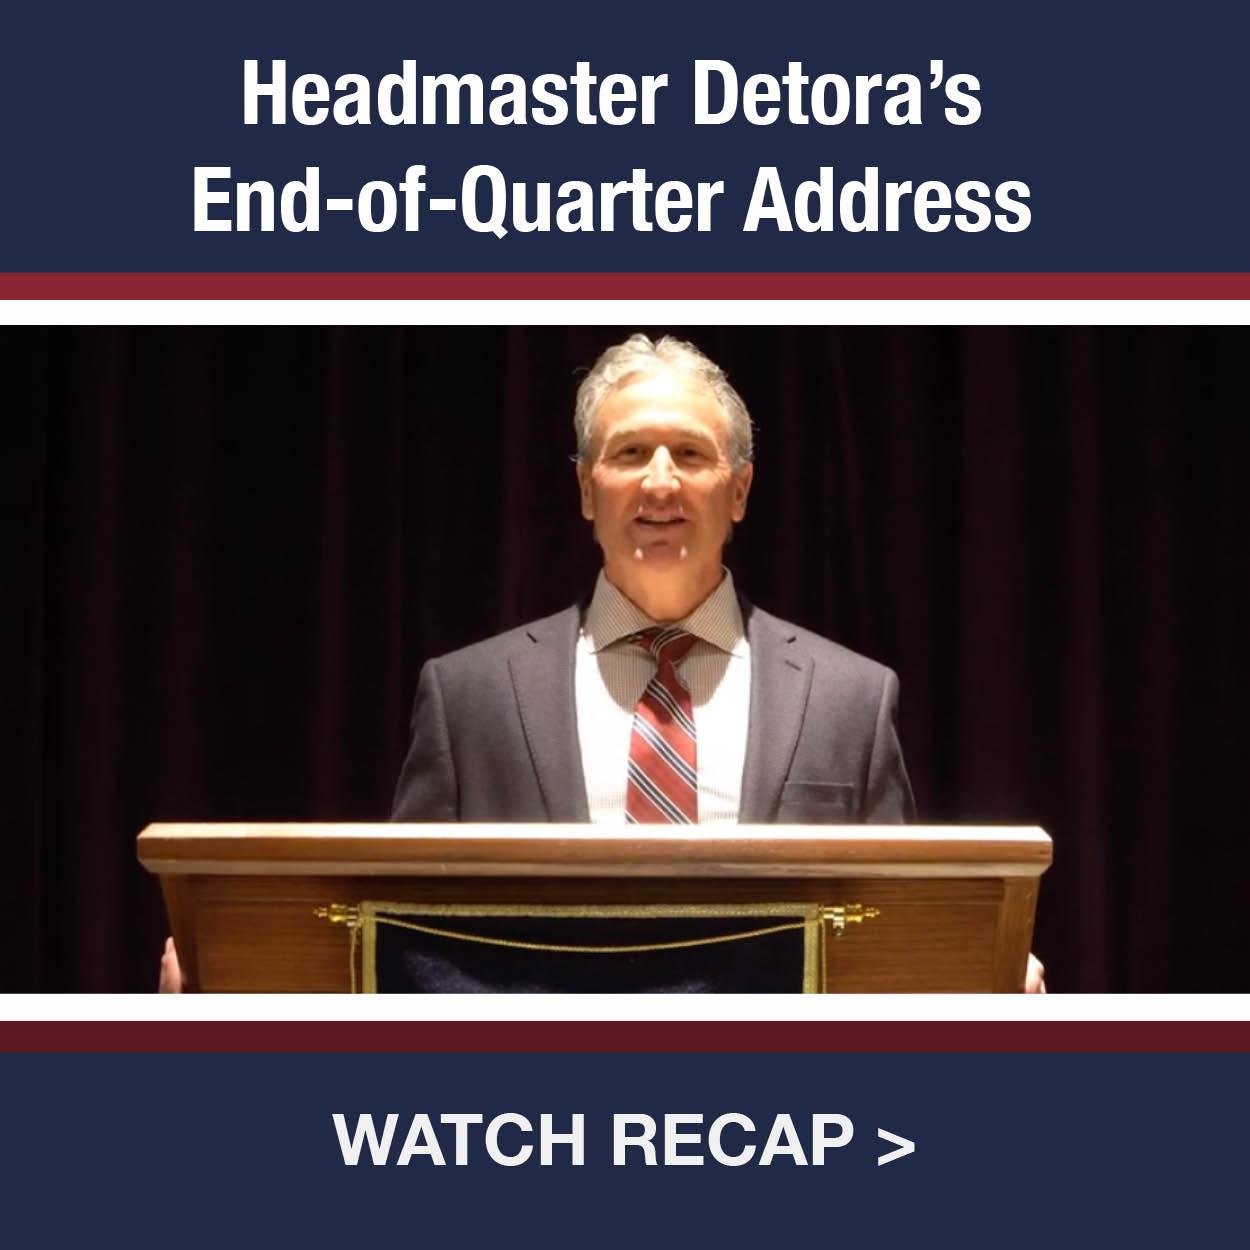 Headmaster's Address